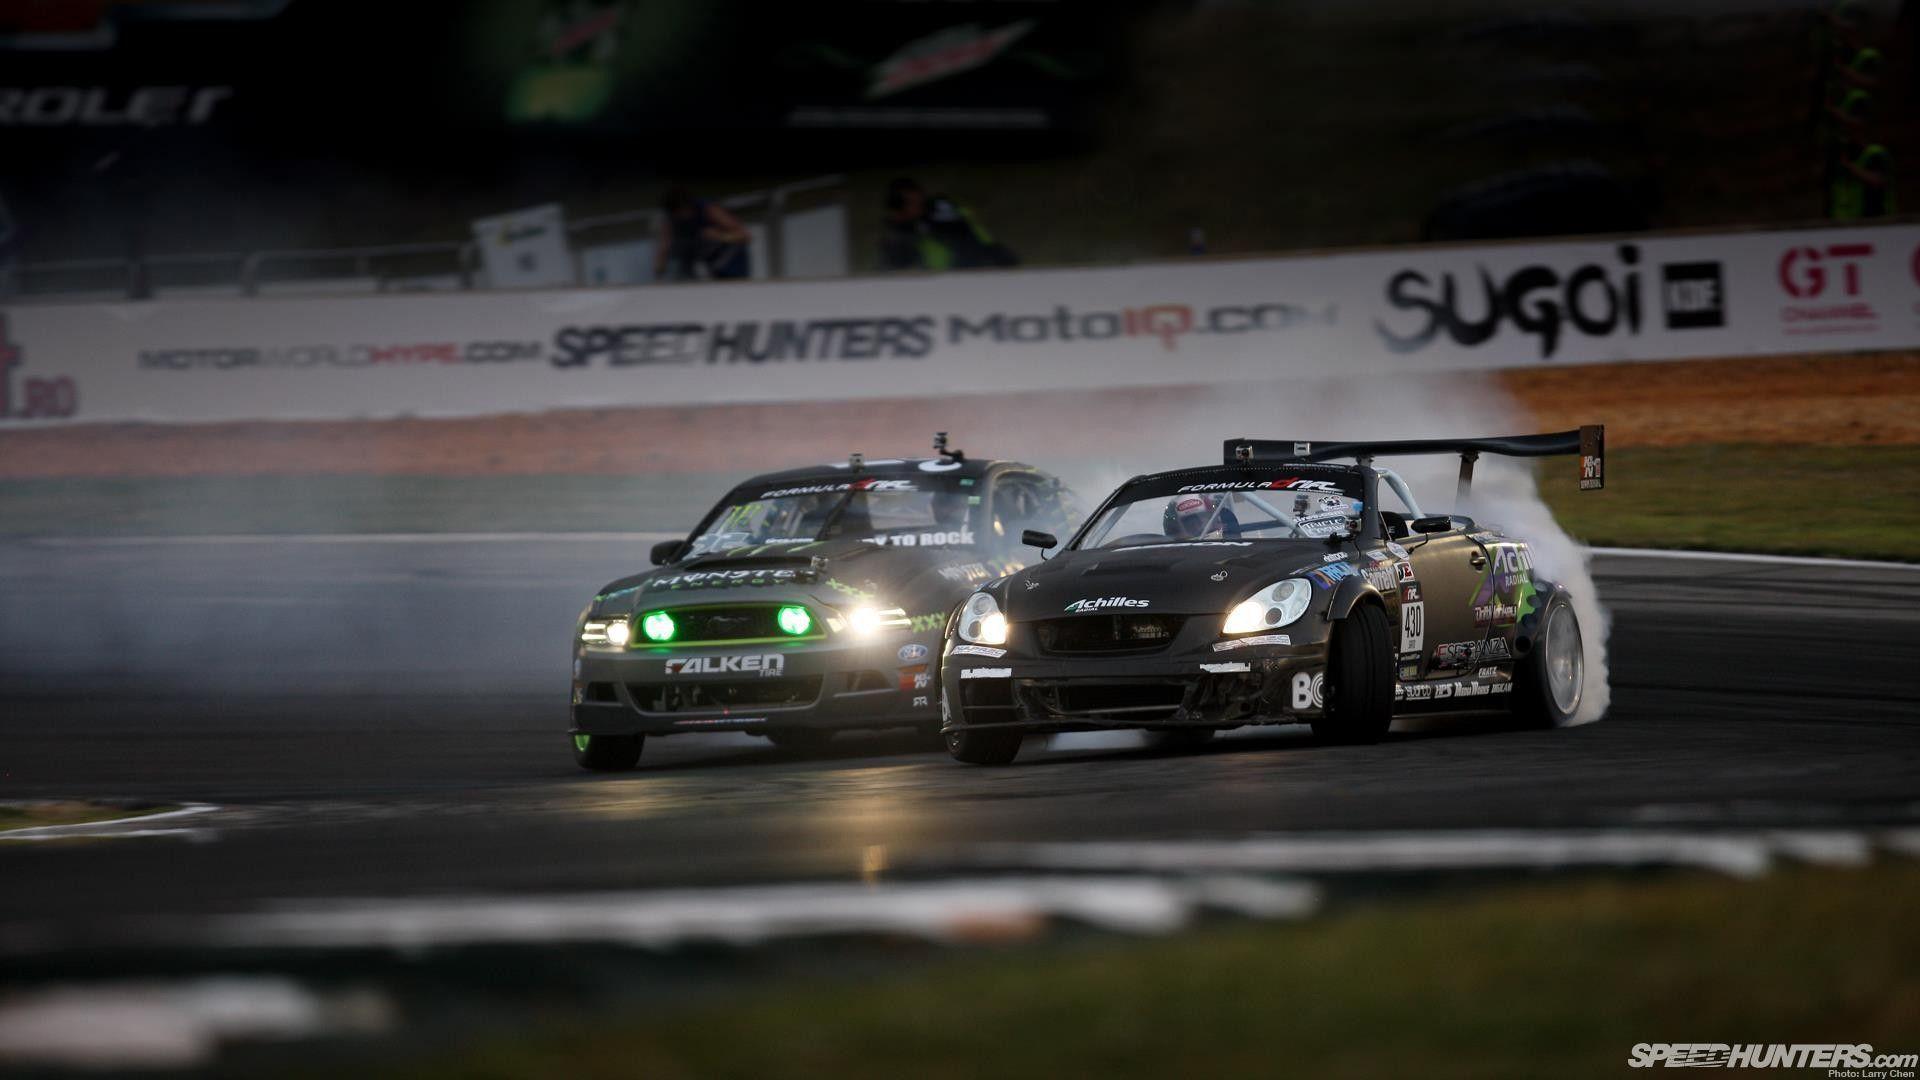 Car drifting wallpaper hd